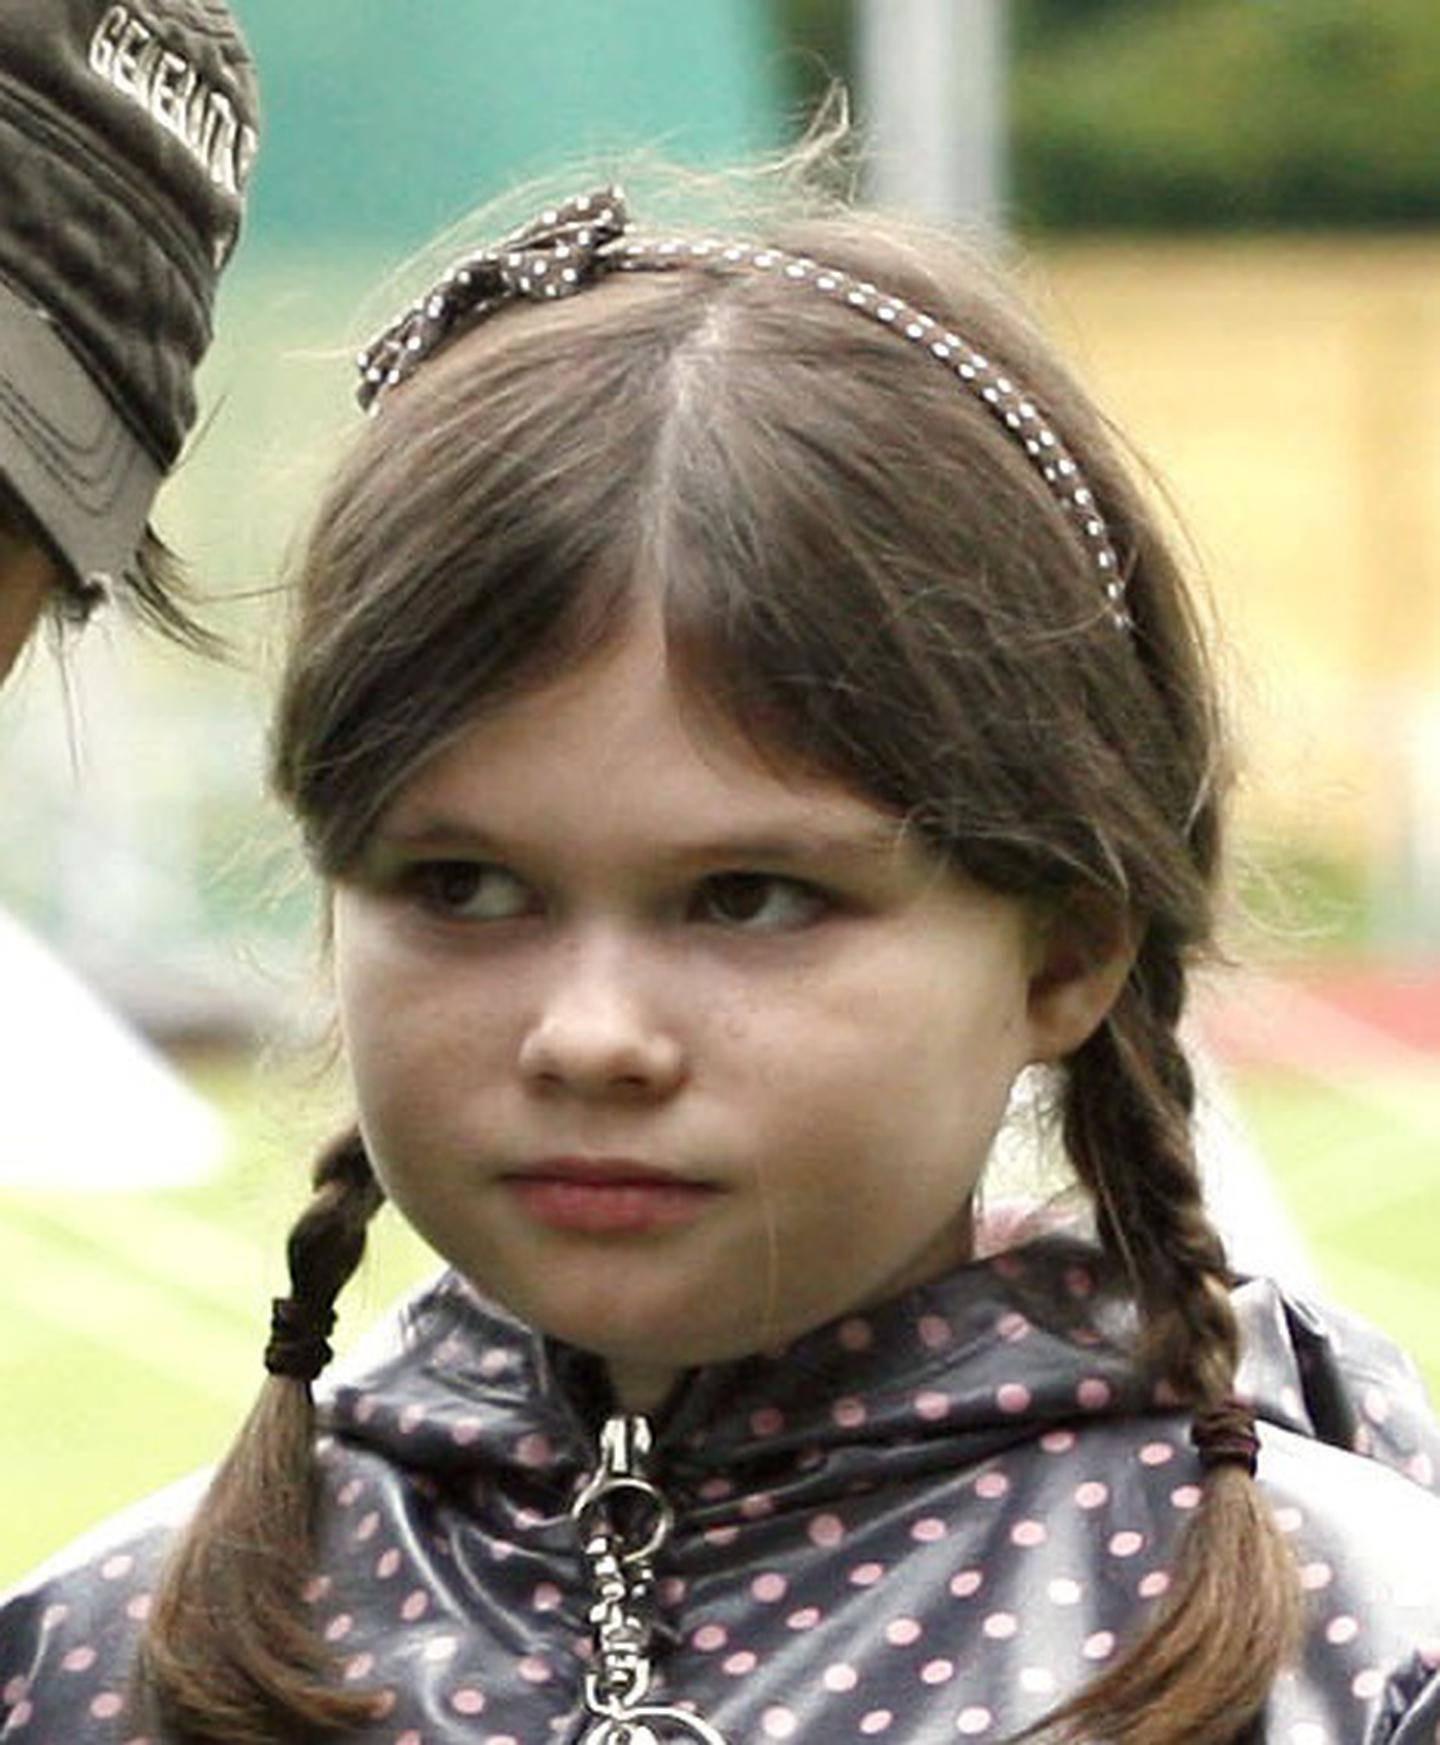 Anna-Leena Uotila